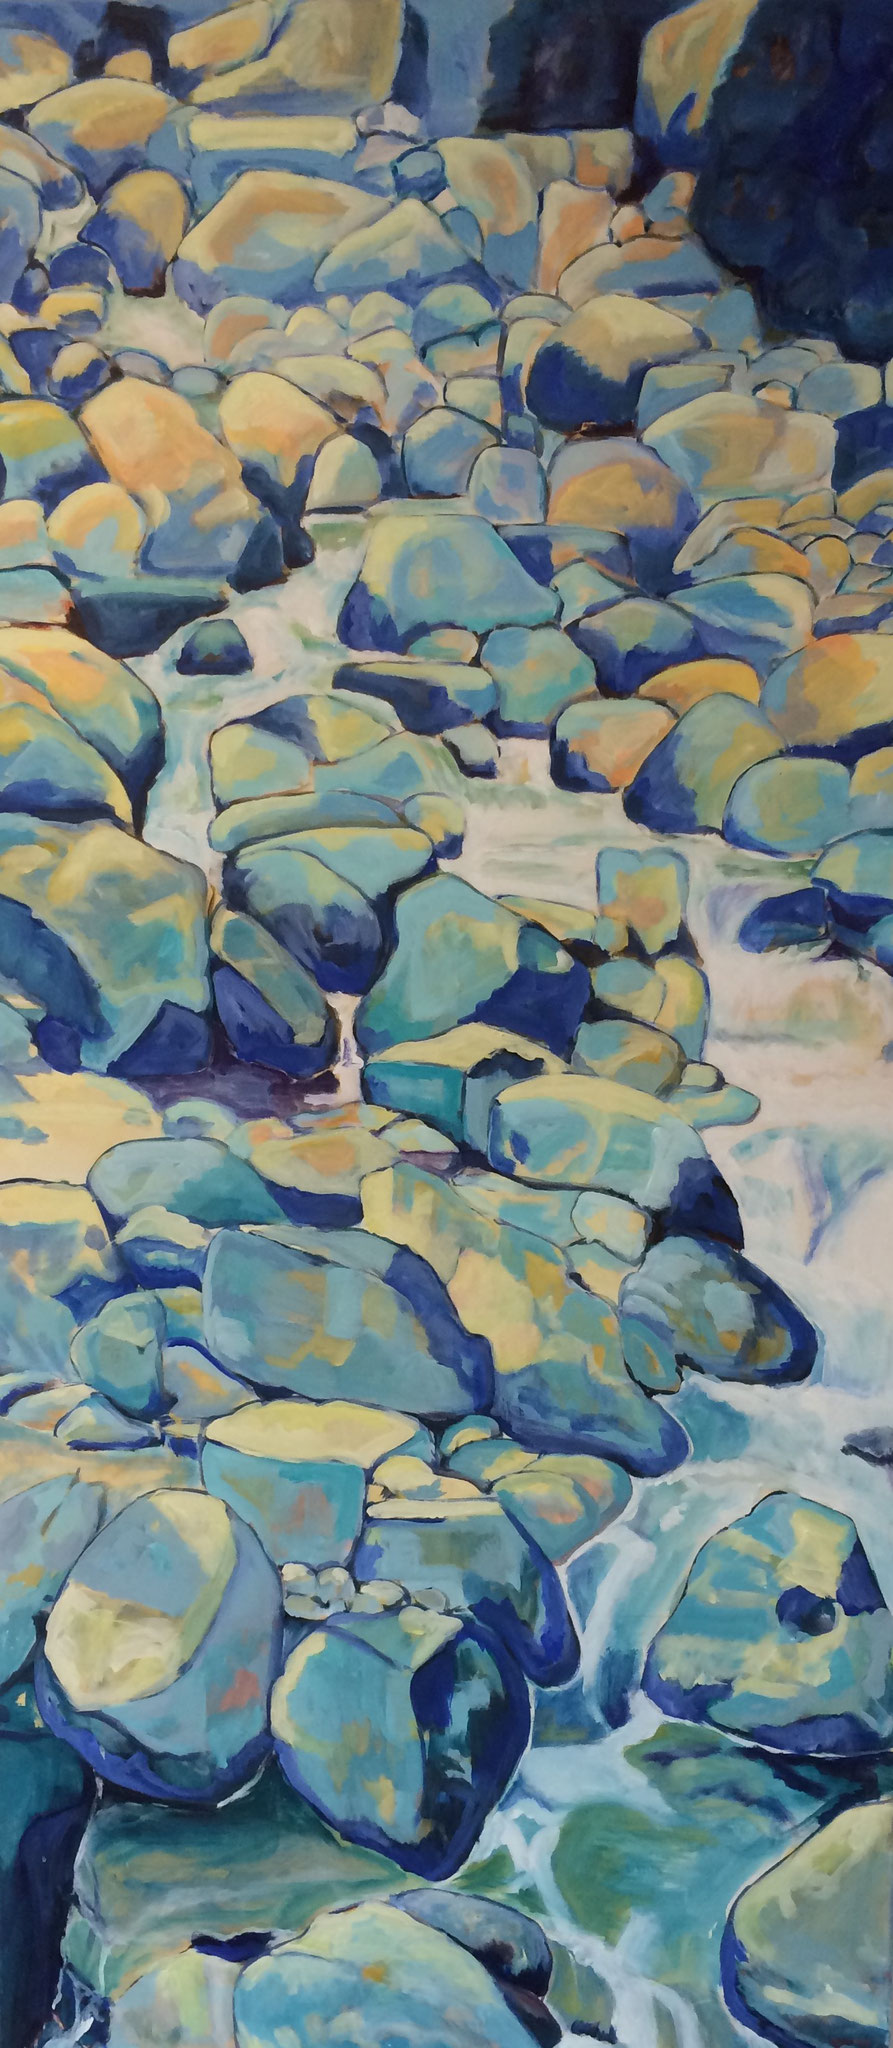 Wasserlauf, 65cm x 146cm, Acryl auf Leinwand, 2012